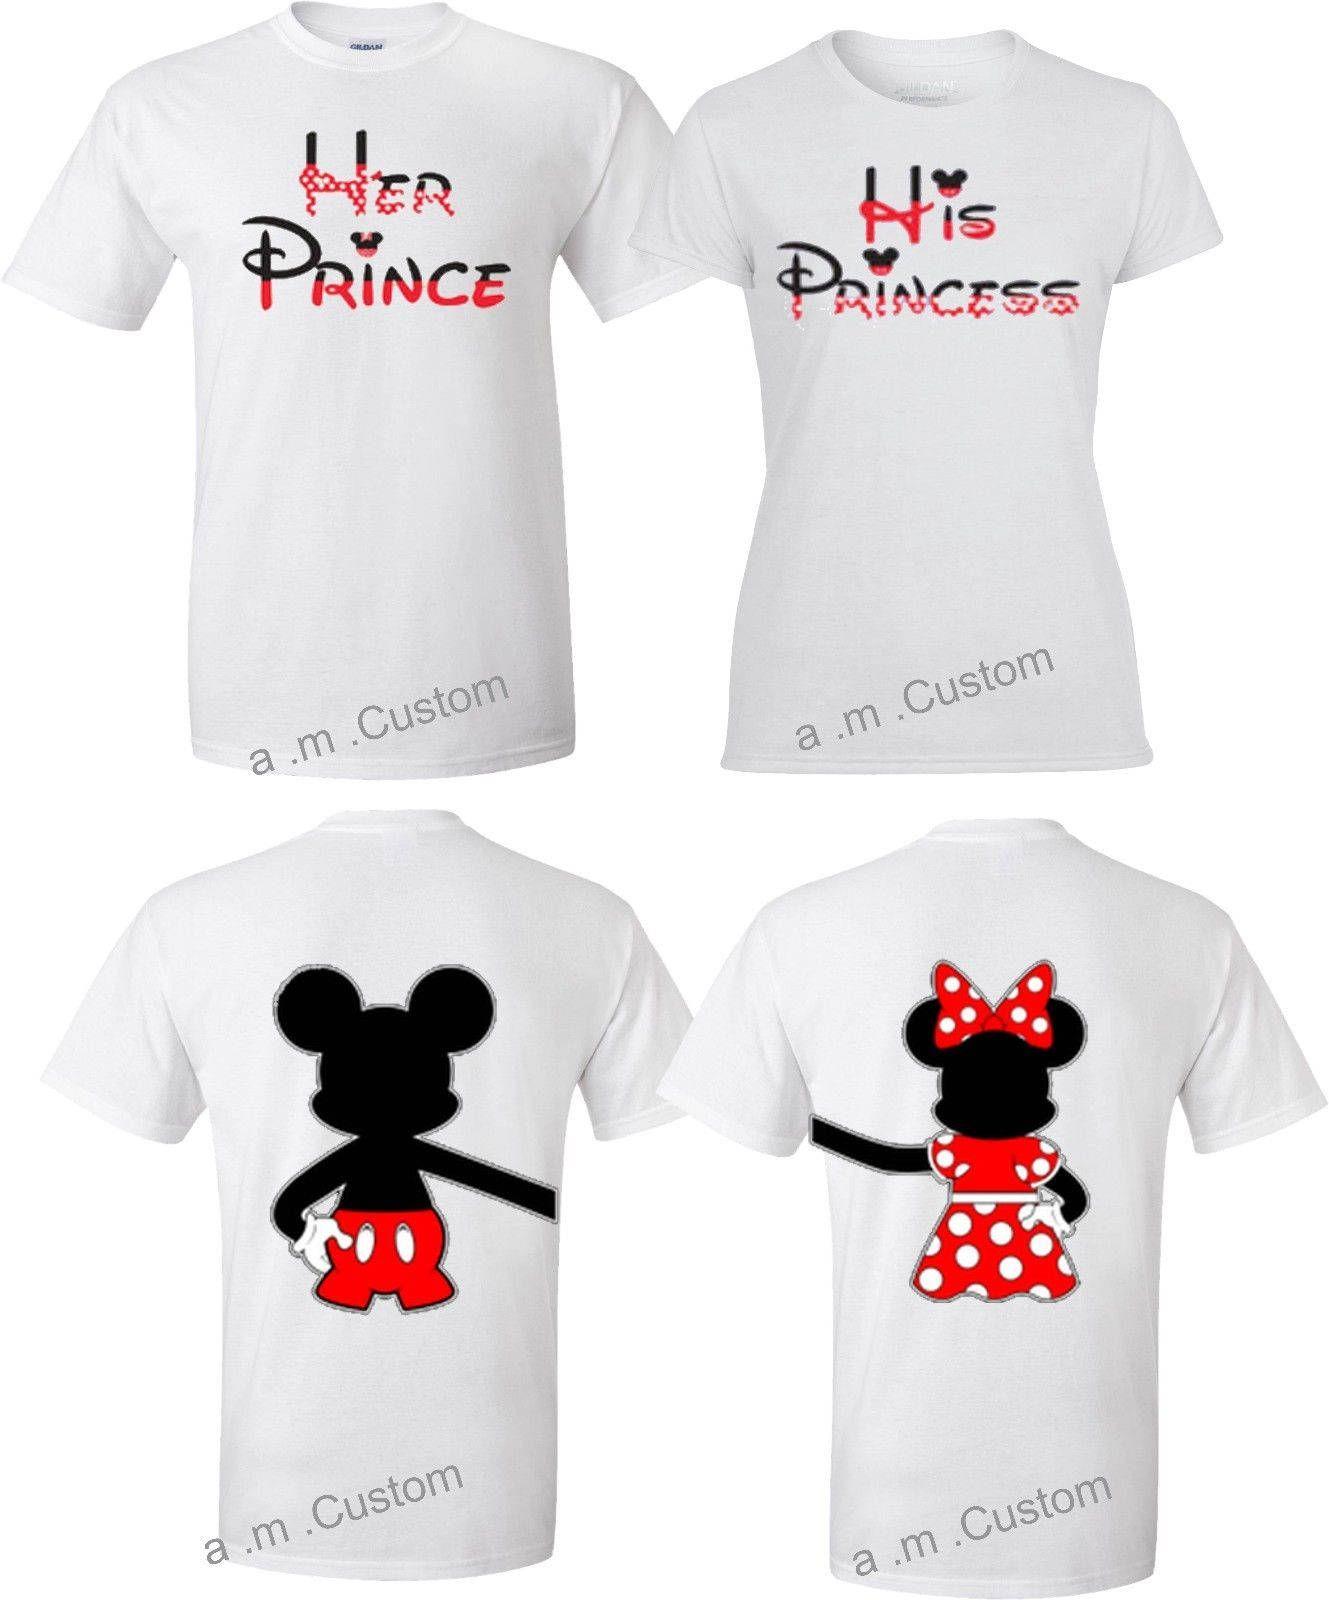 46b19eea61 Mickey and Minnie Disney Prince and Princess couple matching funny cute T-  Shirts by GoCustom